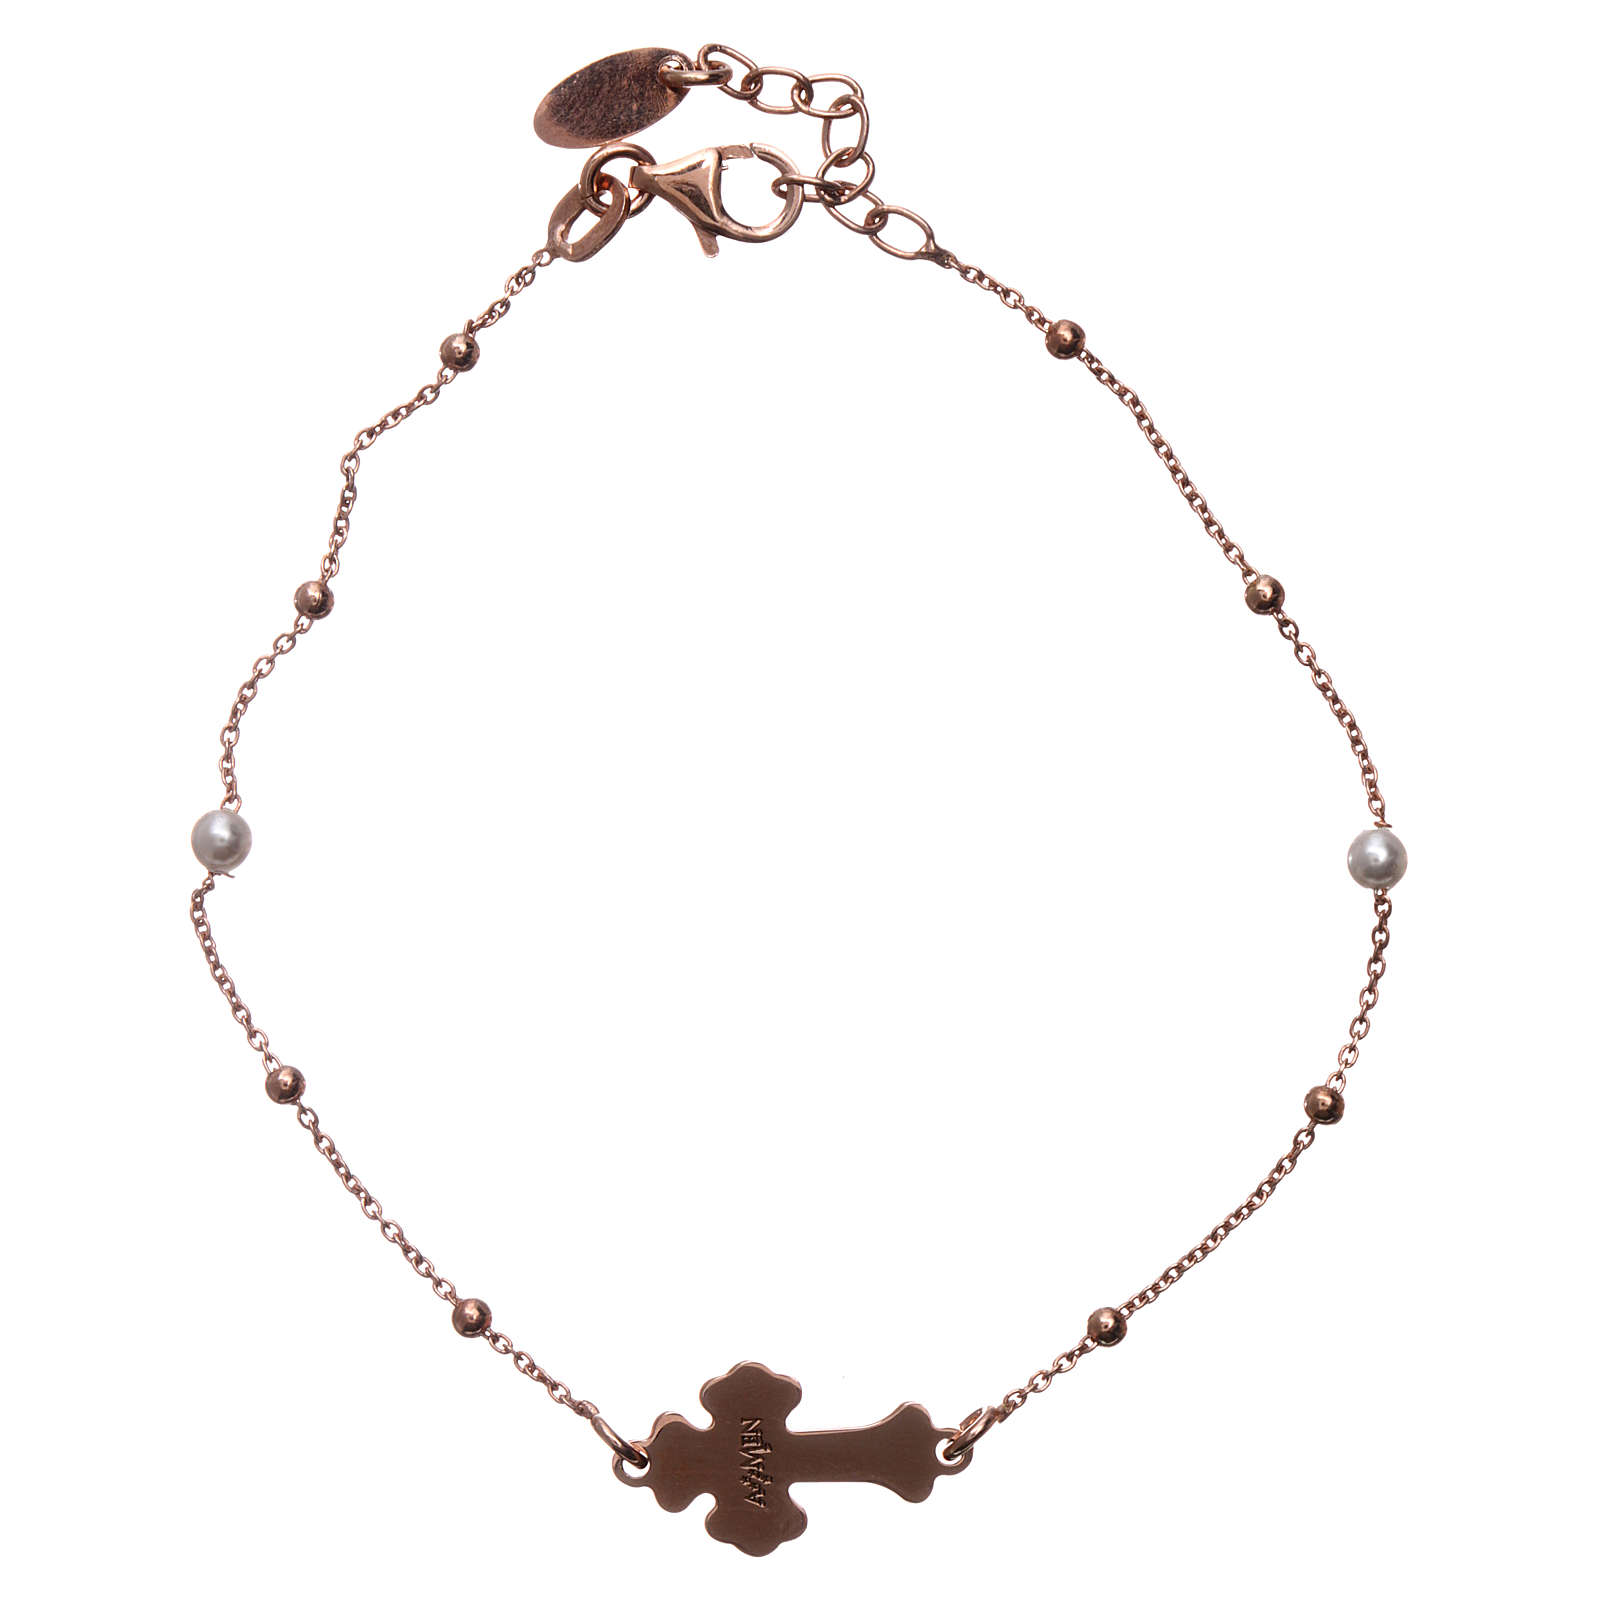 Bracciale AMEN Croce argento 925 madreperla bianca fin. Rosè 4